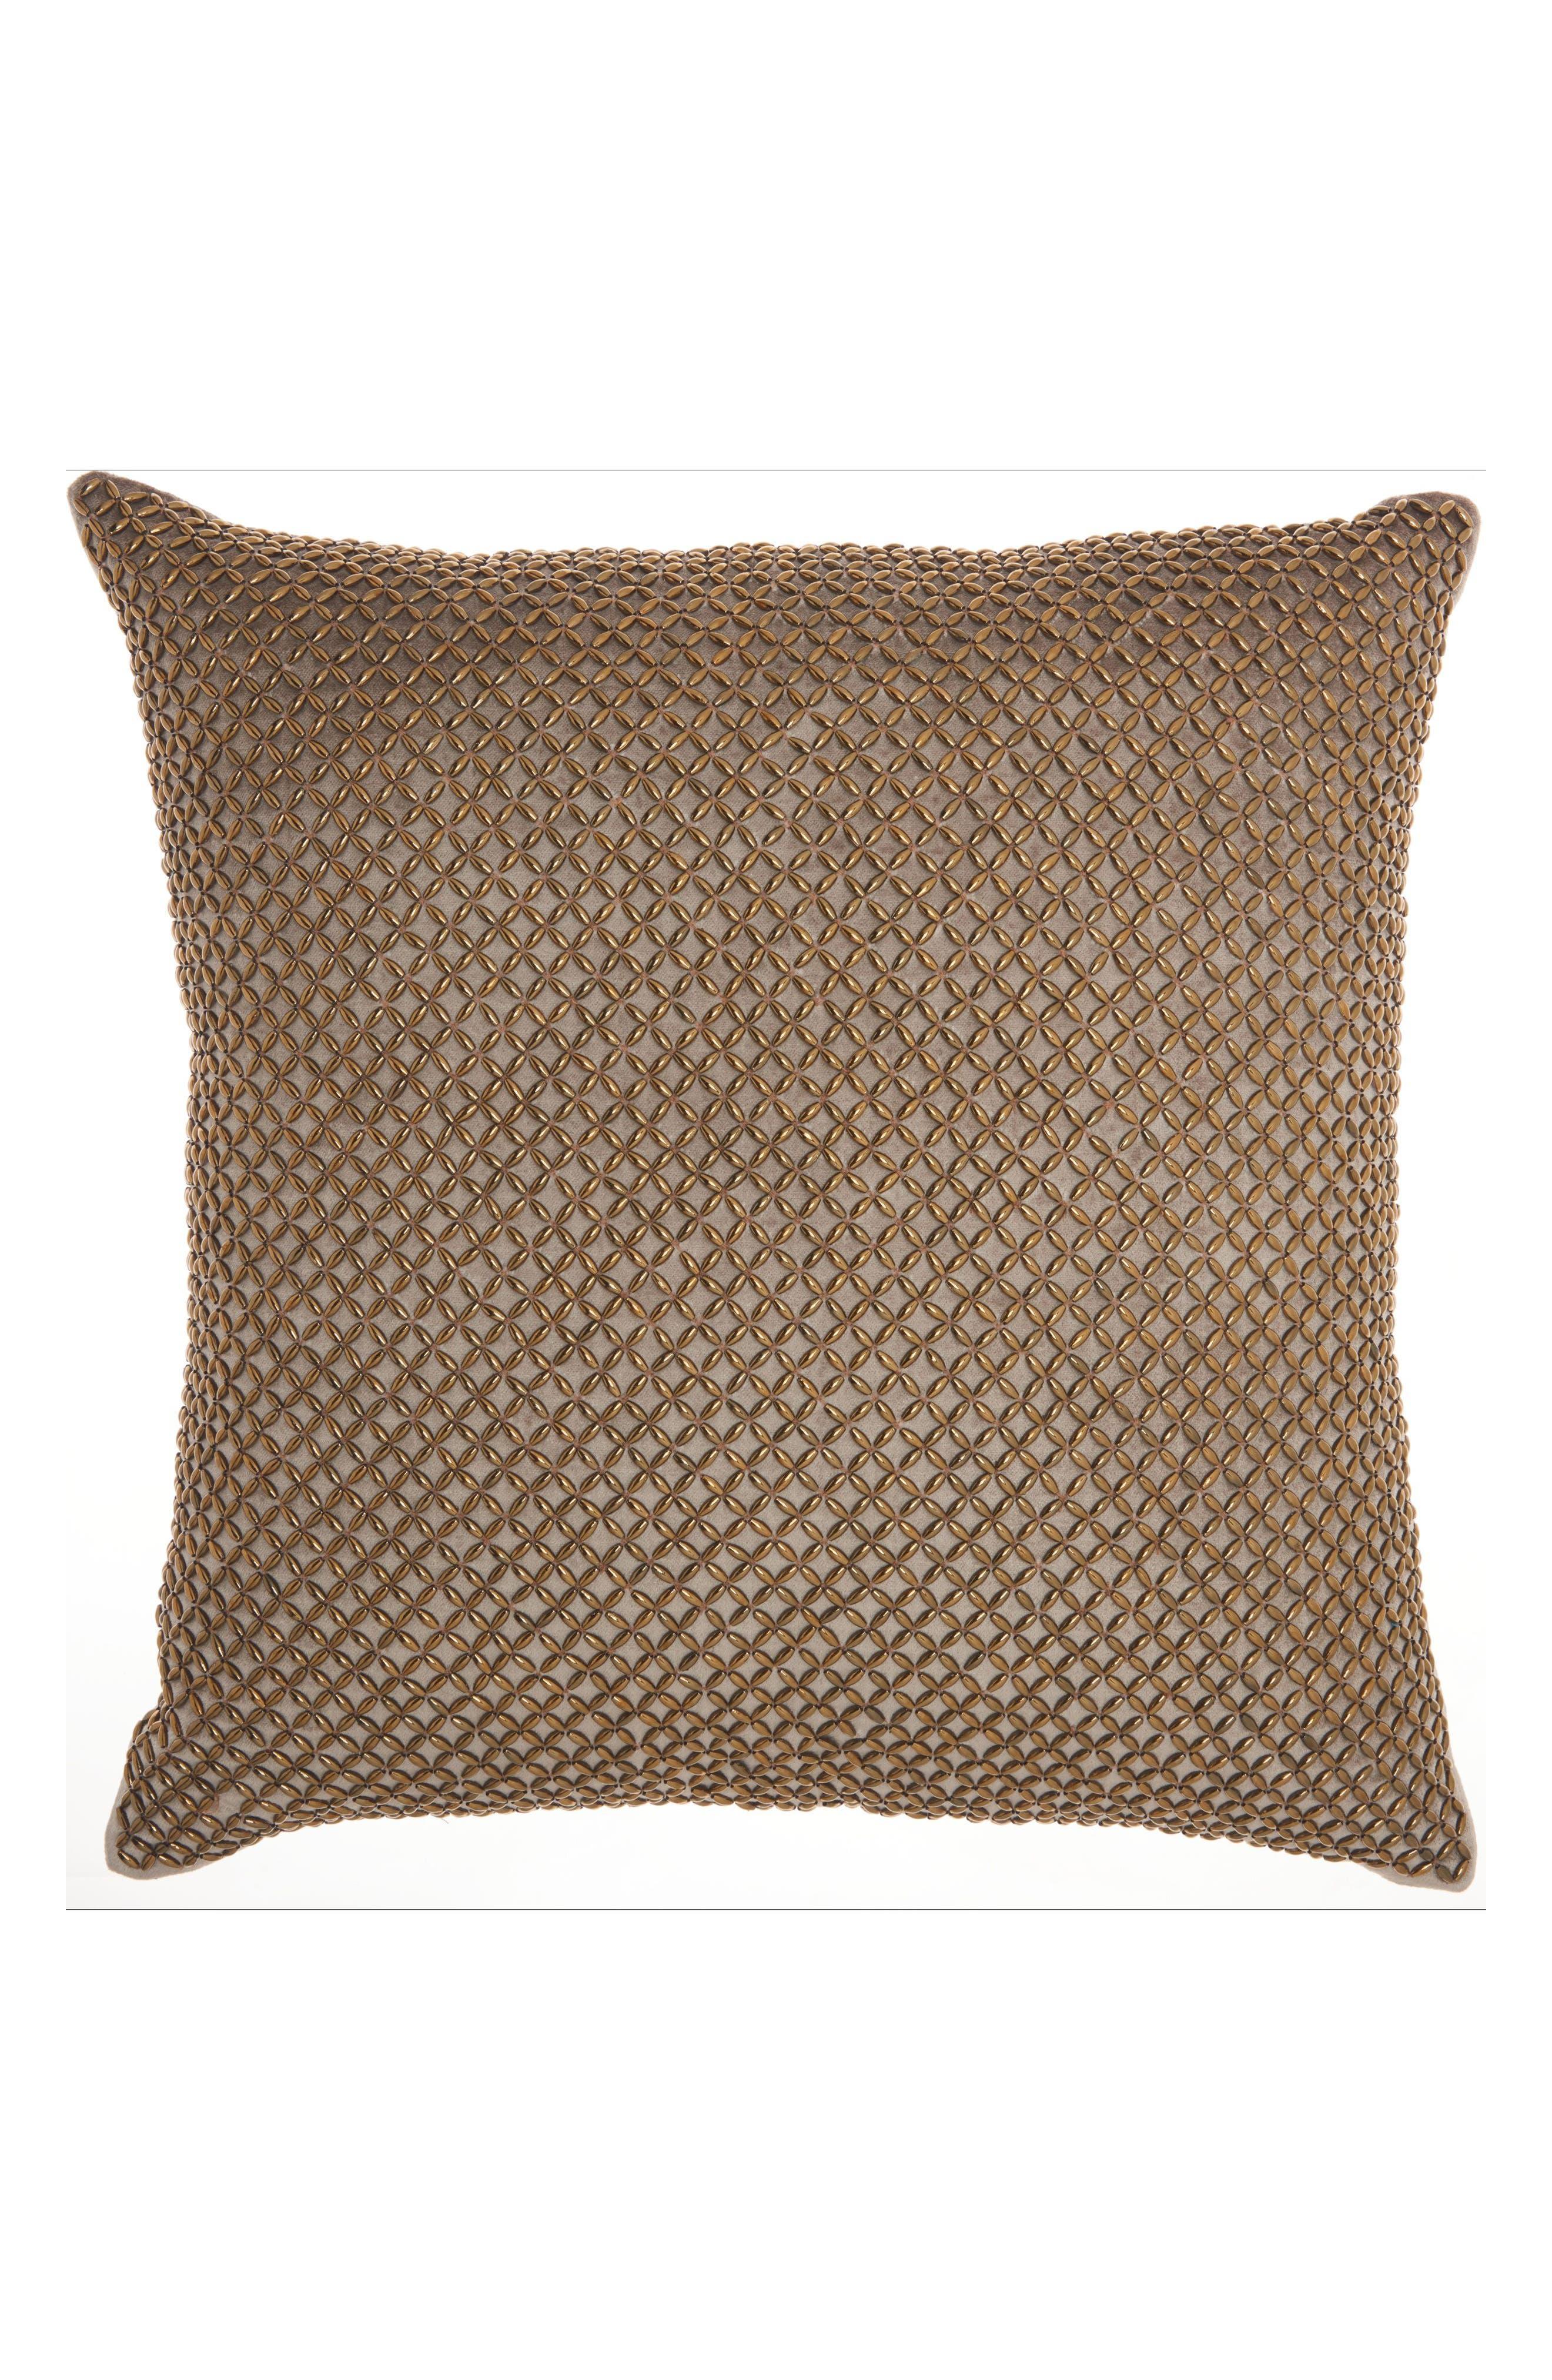 MINA VICTORY Cobble Jewel Accent Pillow, Main, color, 280